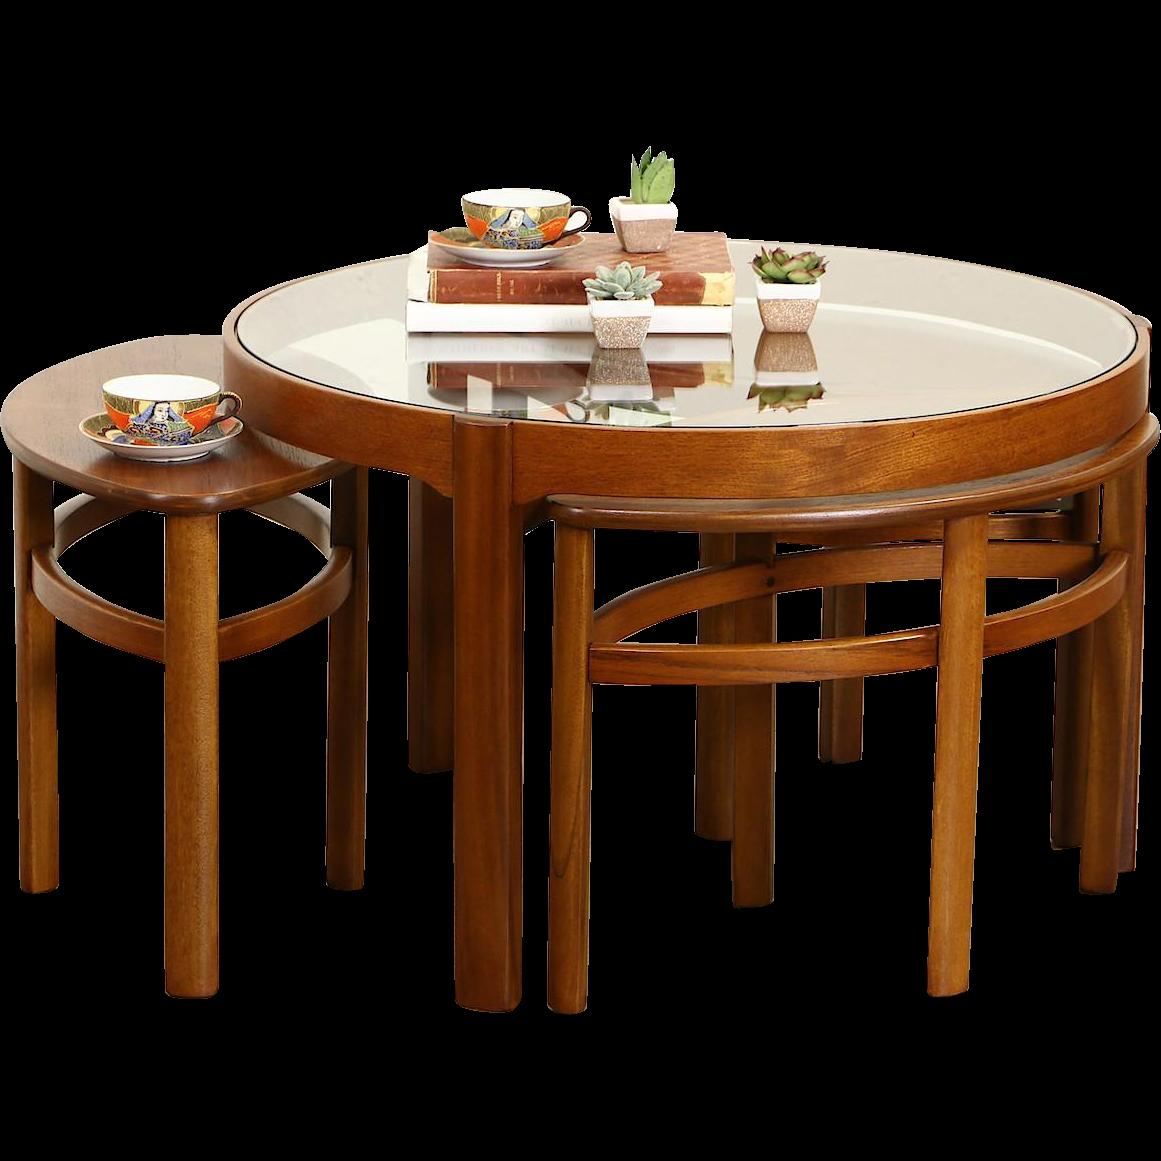 English Midcentury Modern 1960 Vintage Teak Coffee & Nesting Tables Set